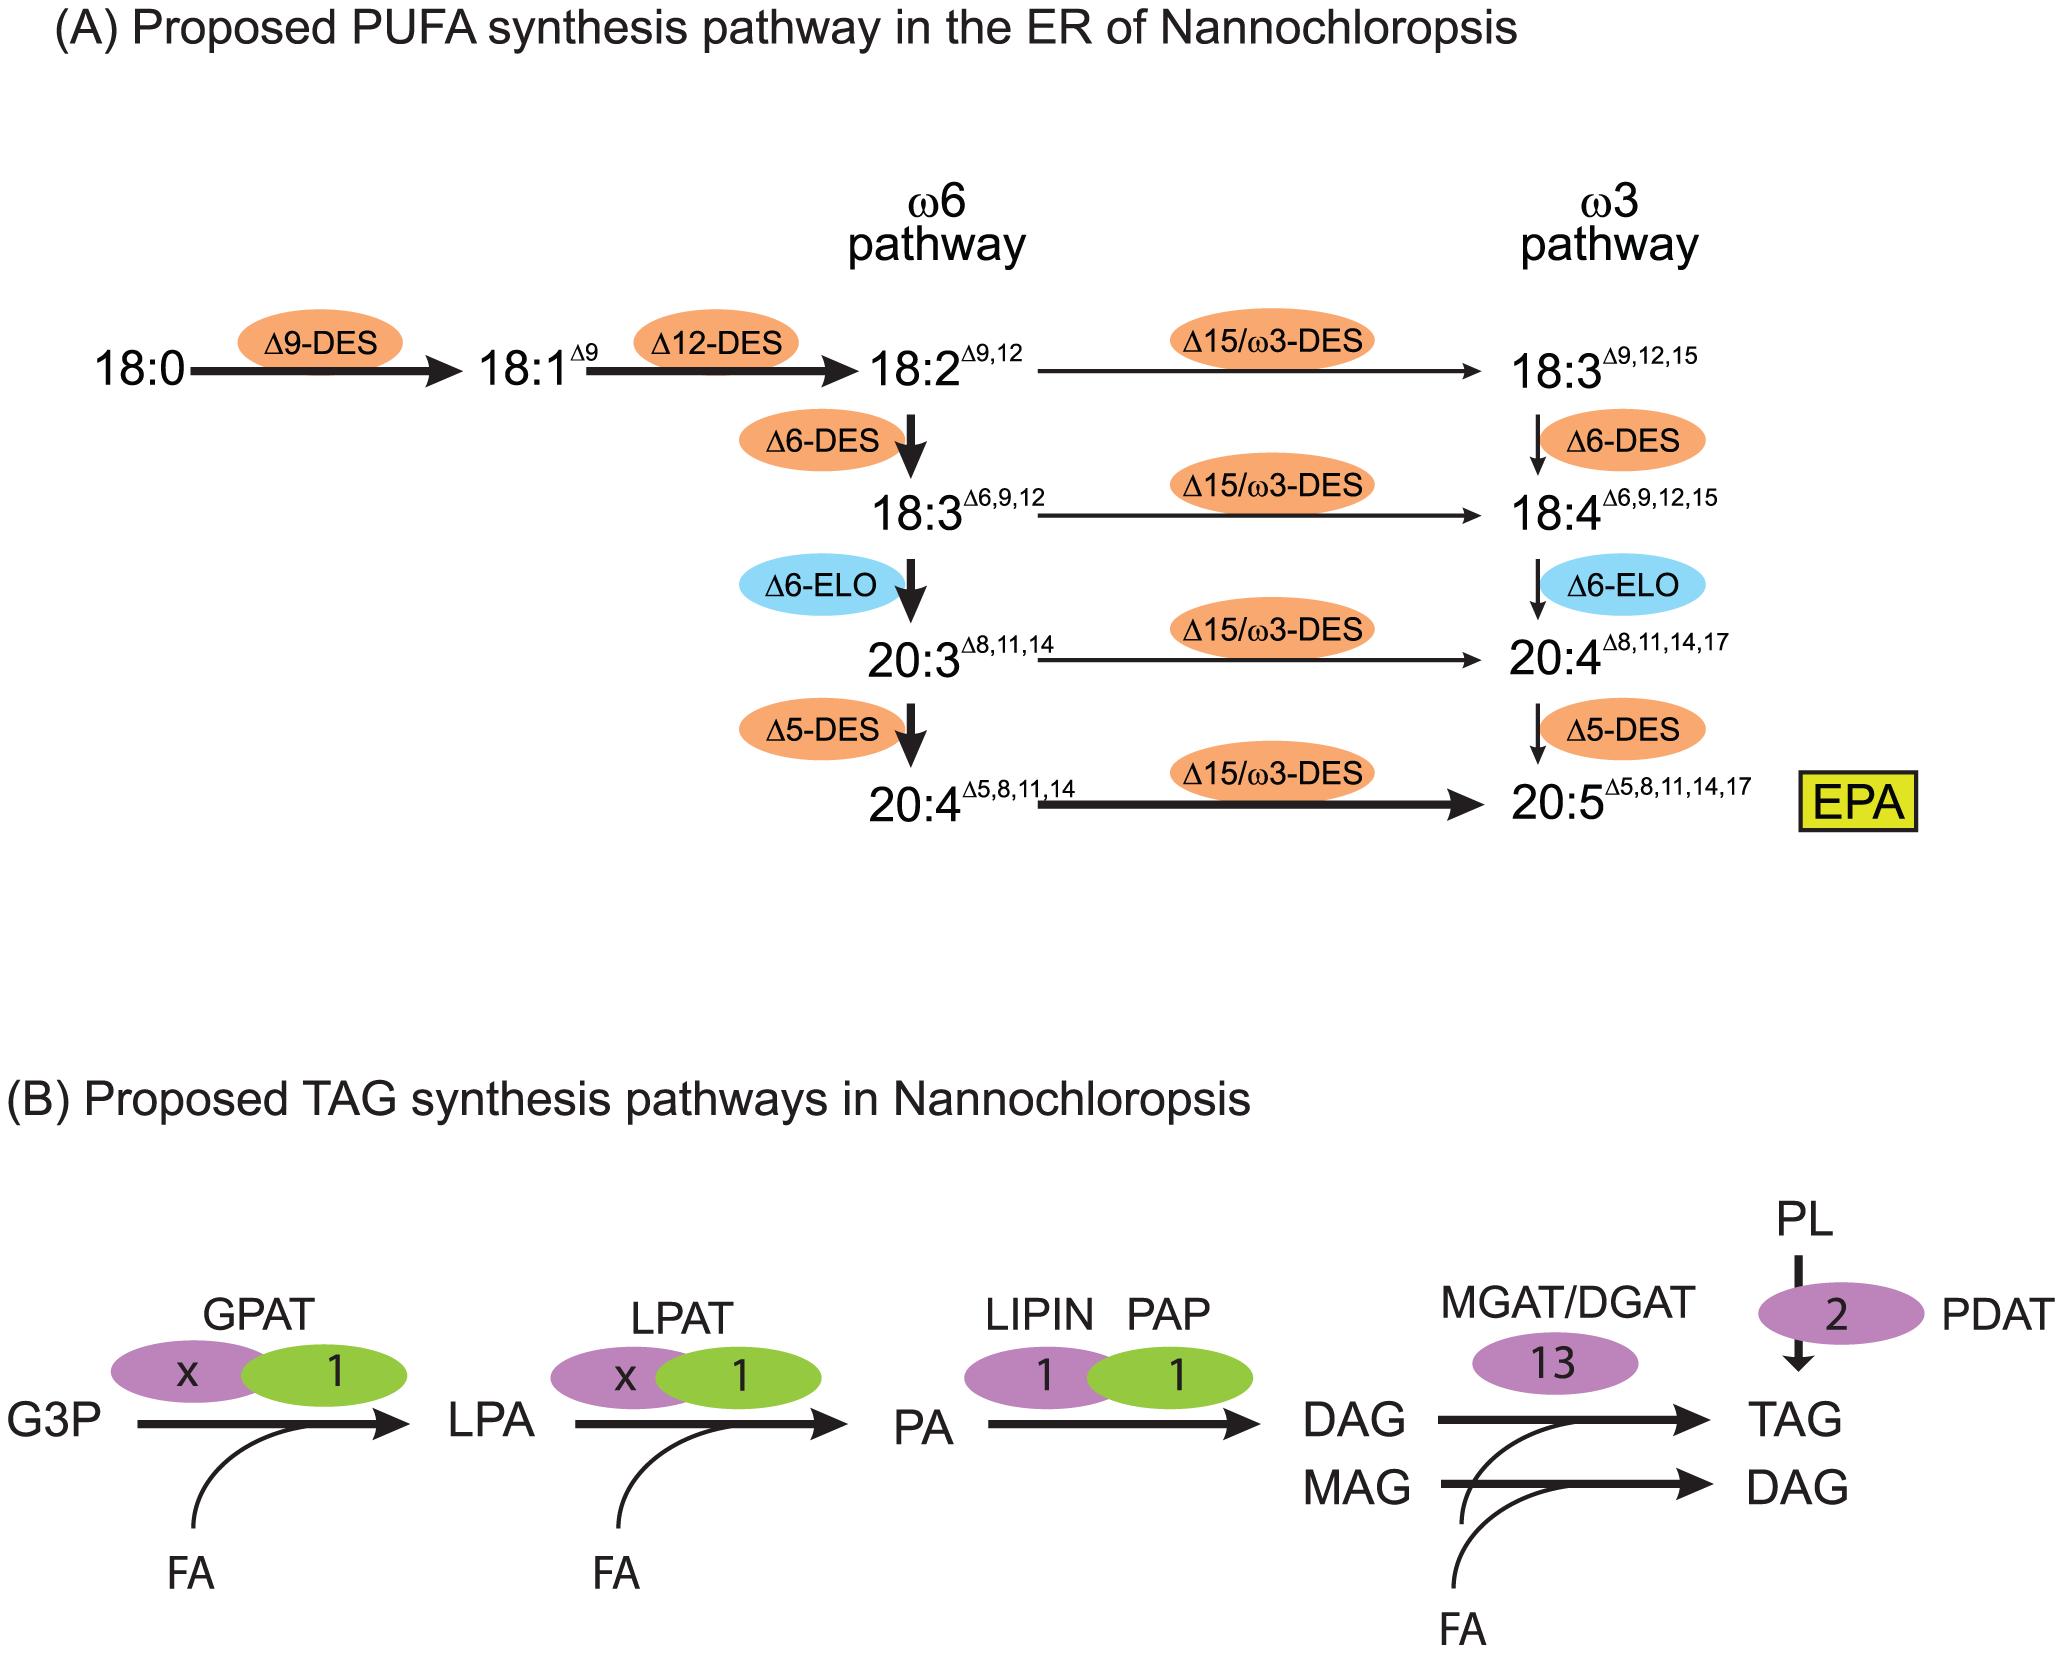 Lipid assembly and modification.